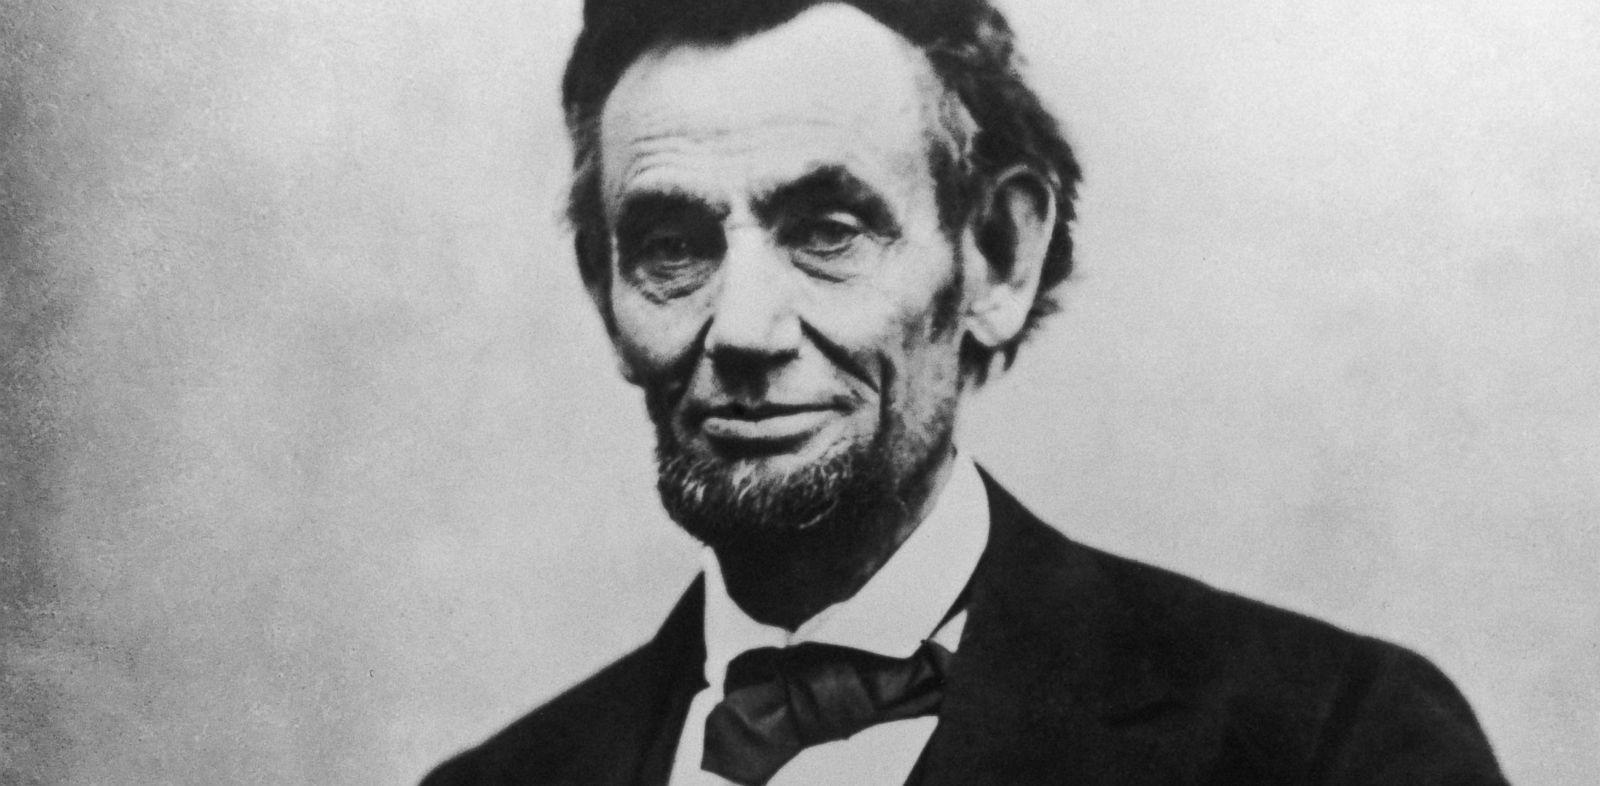 Tremendous Abraham Lincolns Gettysburg Address On The 150Th Anniversary Short Hairstyles Gunalazisus